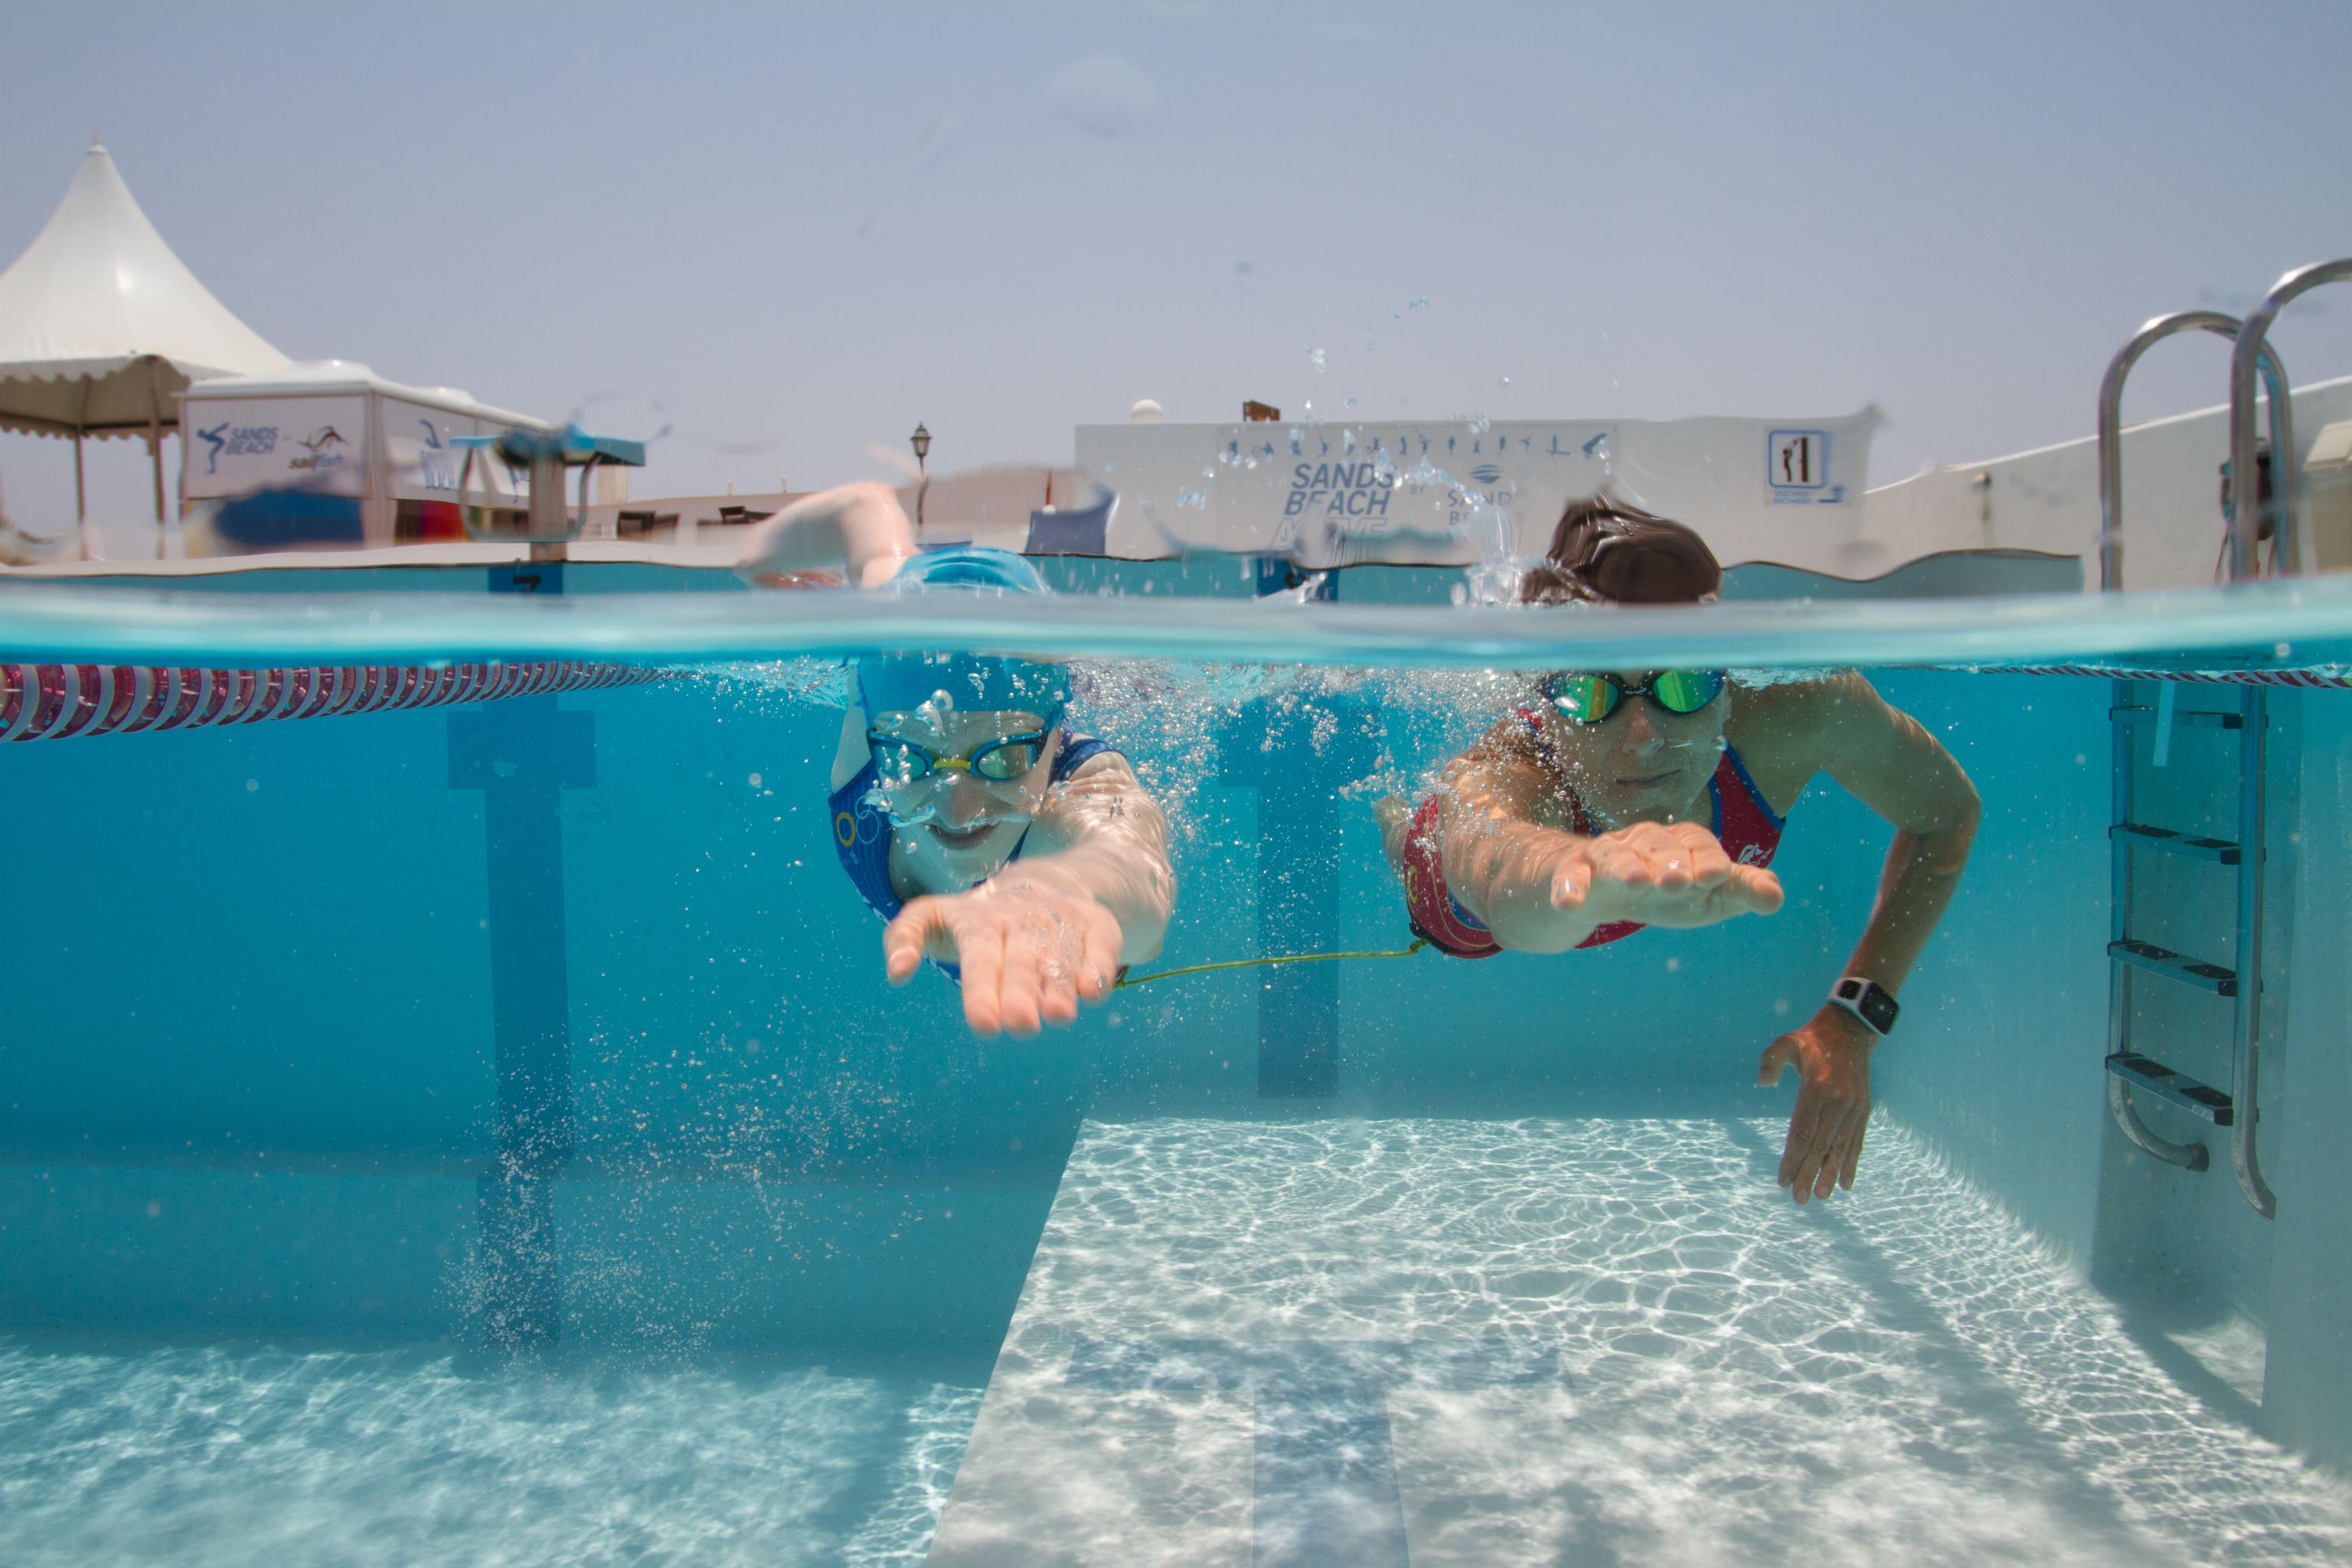 PETRA VAN BORM/SANDS BEACH ACTIVE